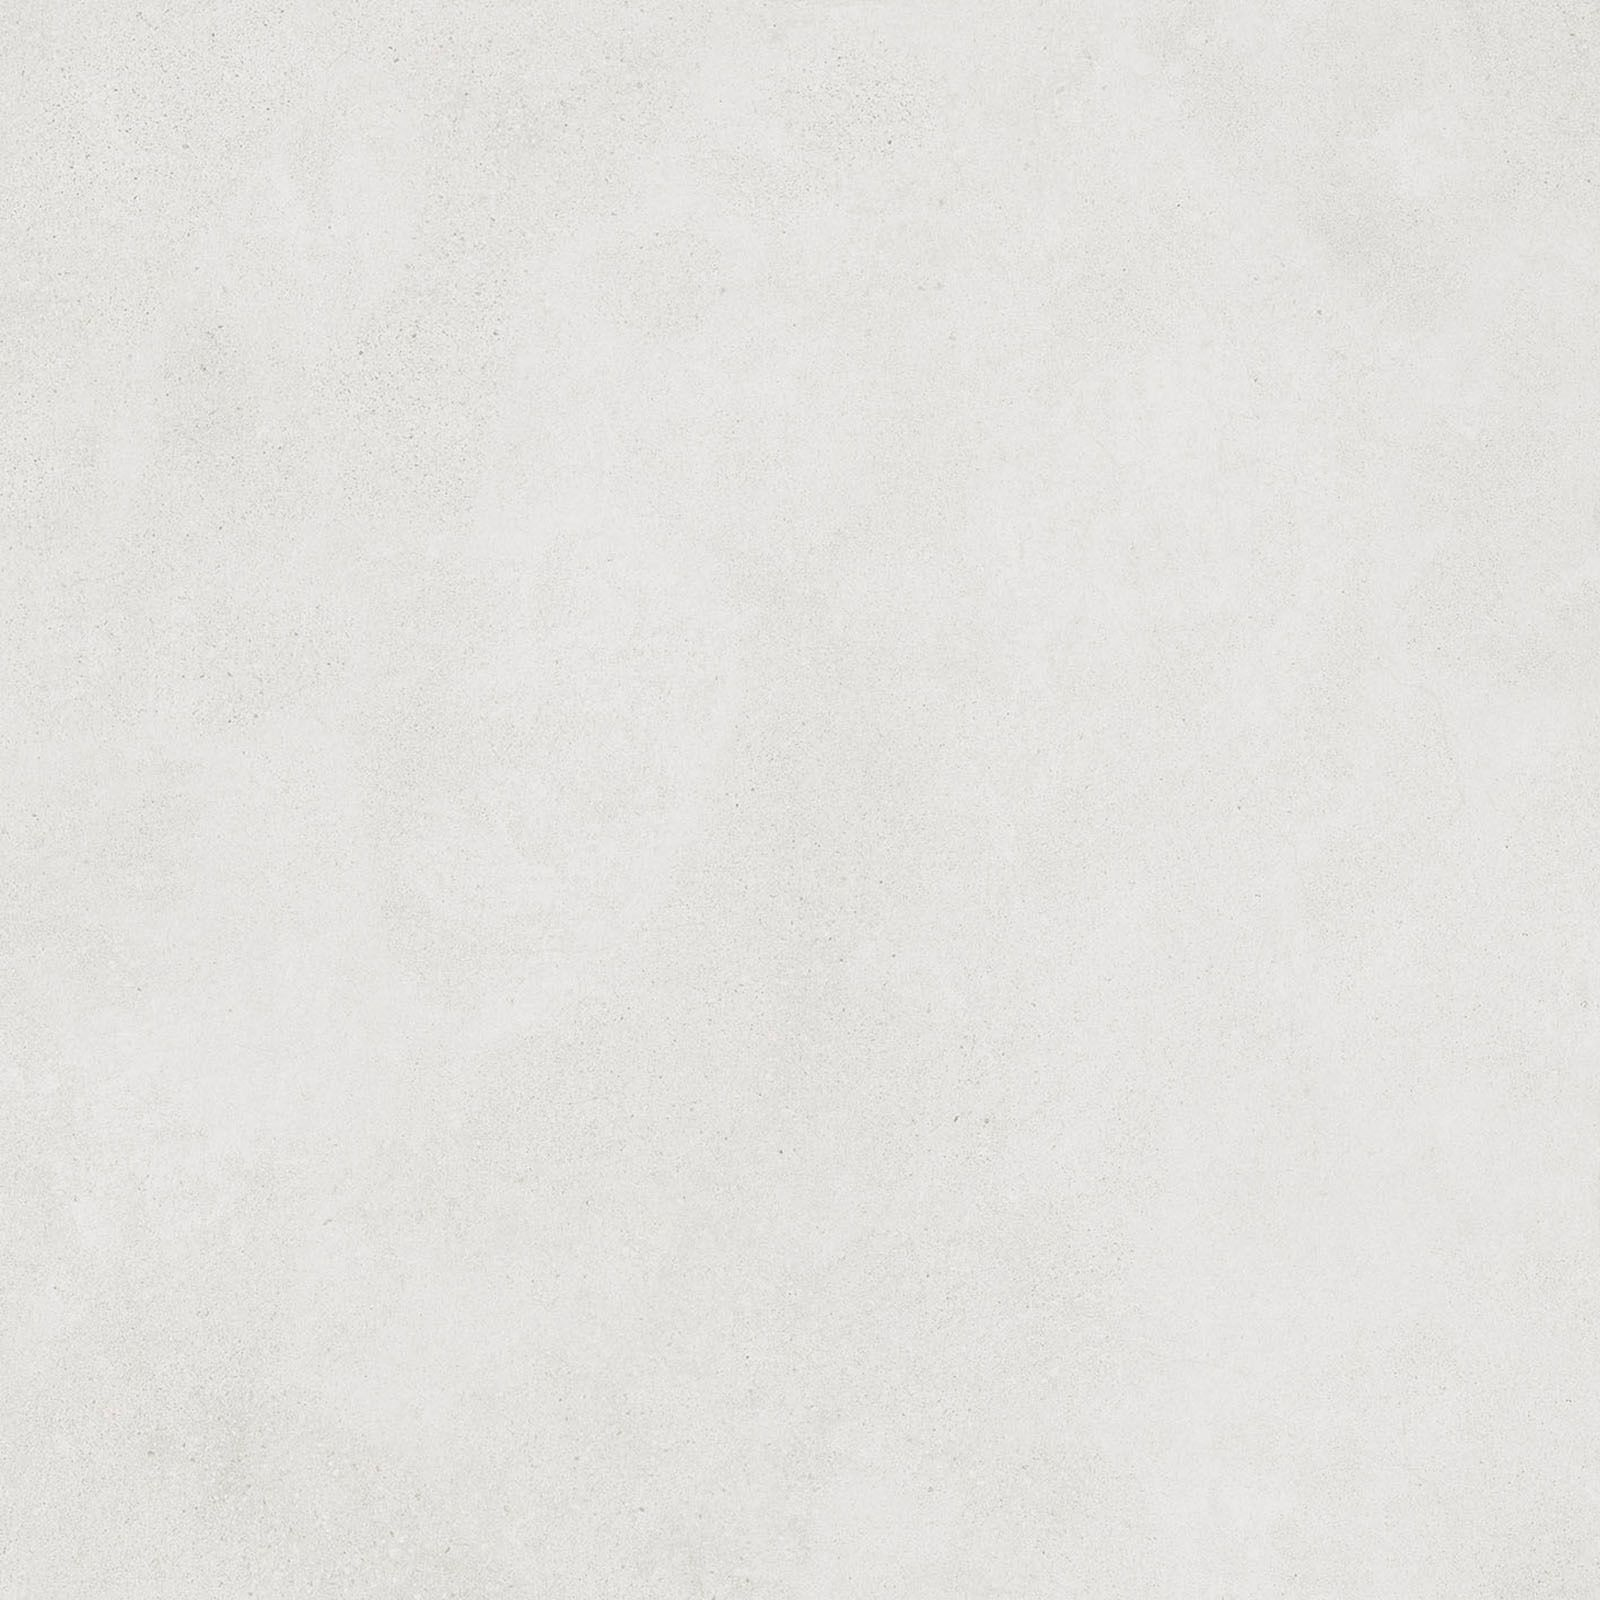 INTEGRA WHITE 120x120 REC